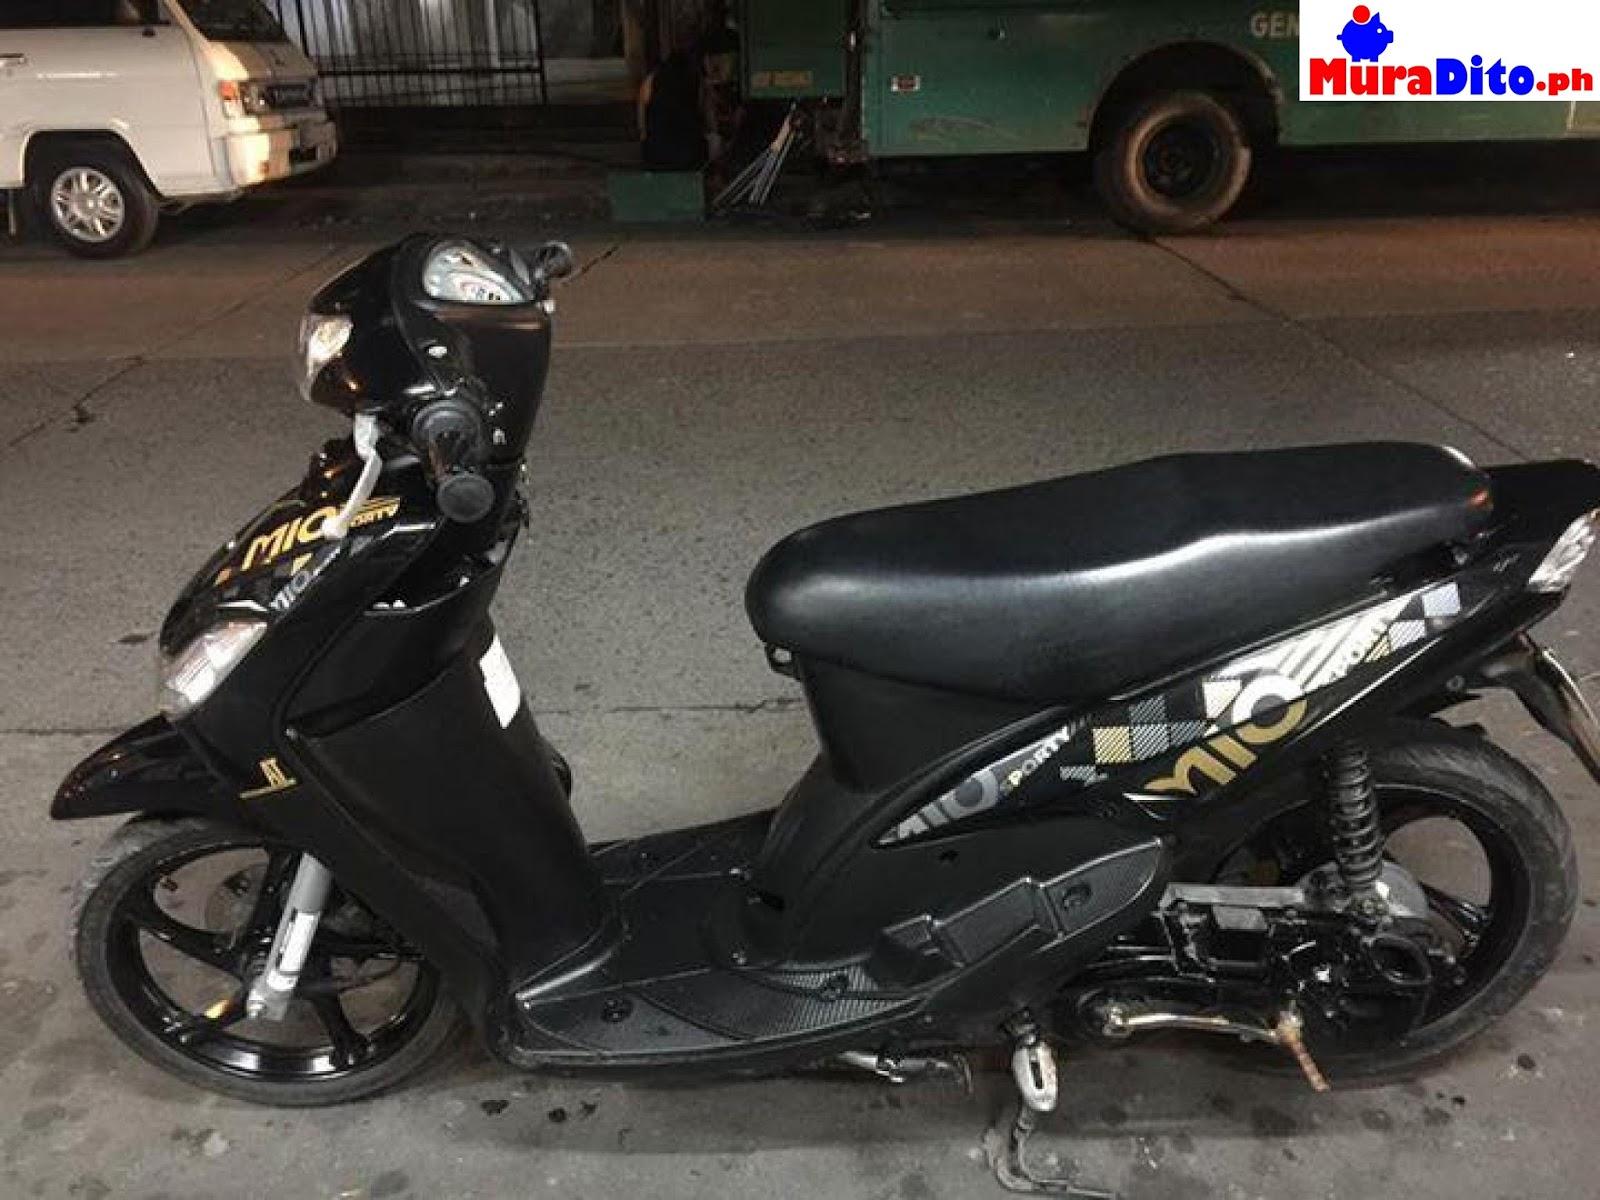 Yamaha Yw Price